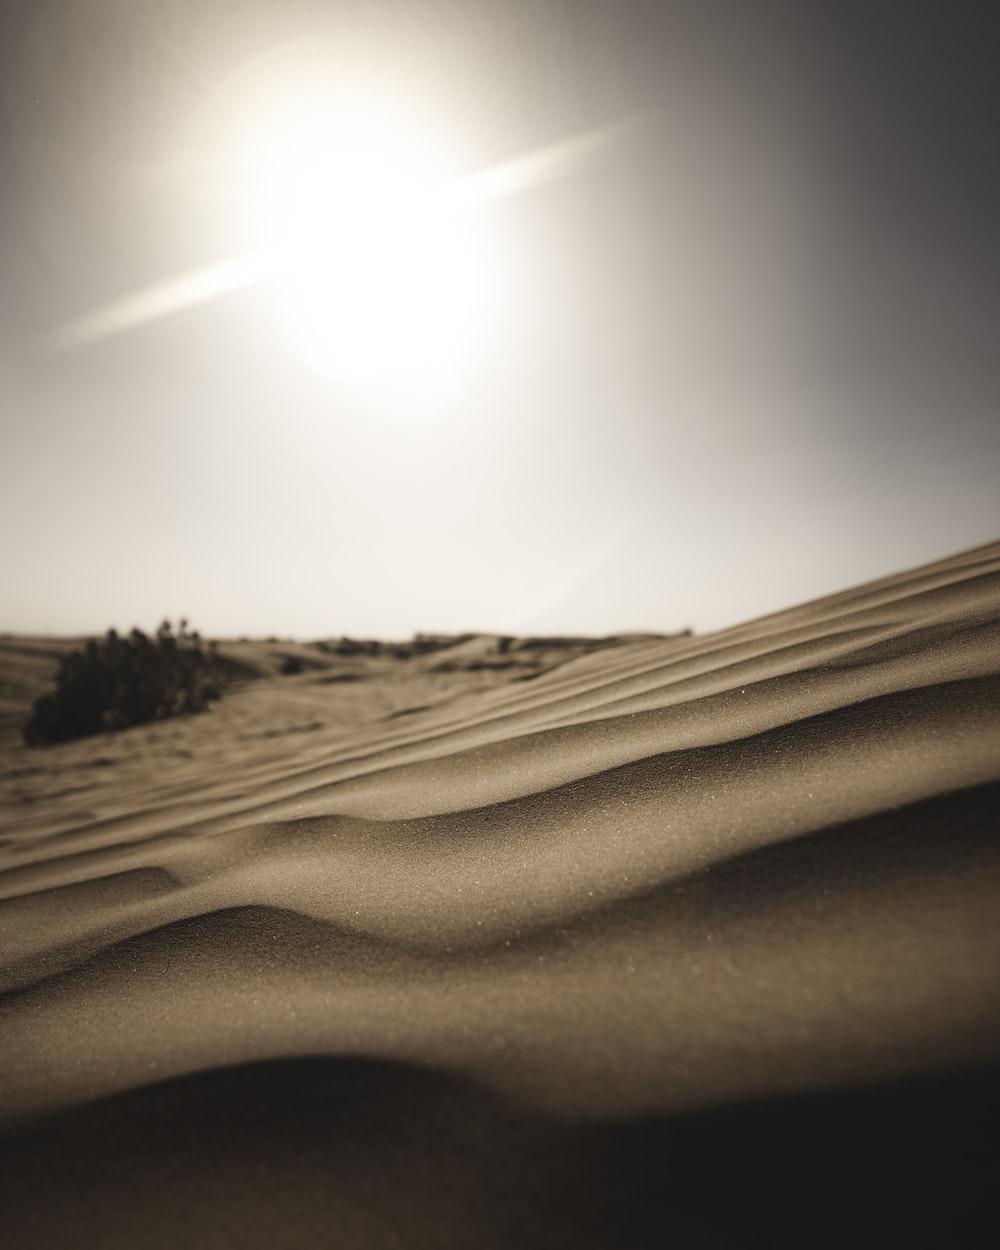 silhouette of plant on desert during daytime